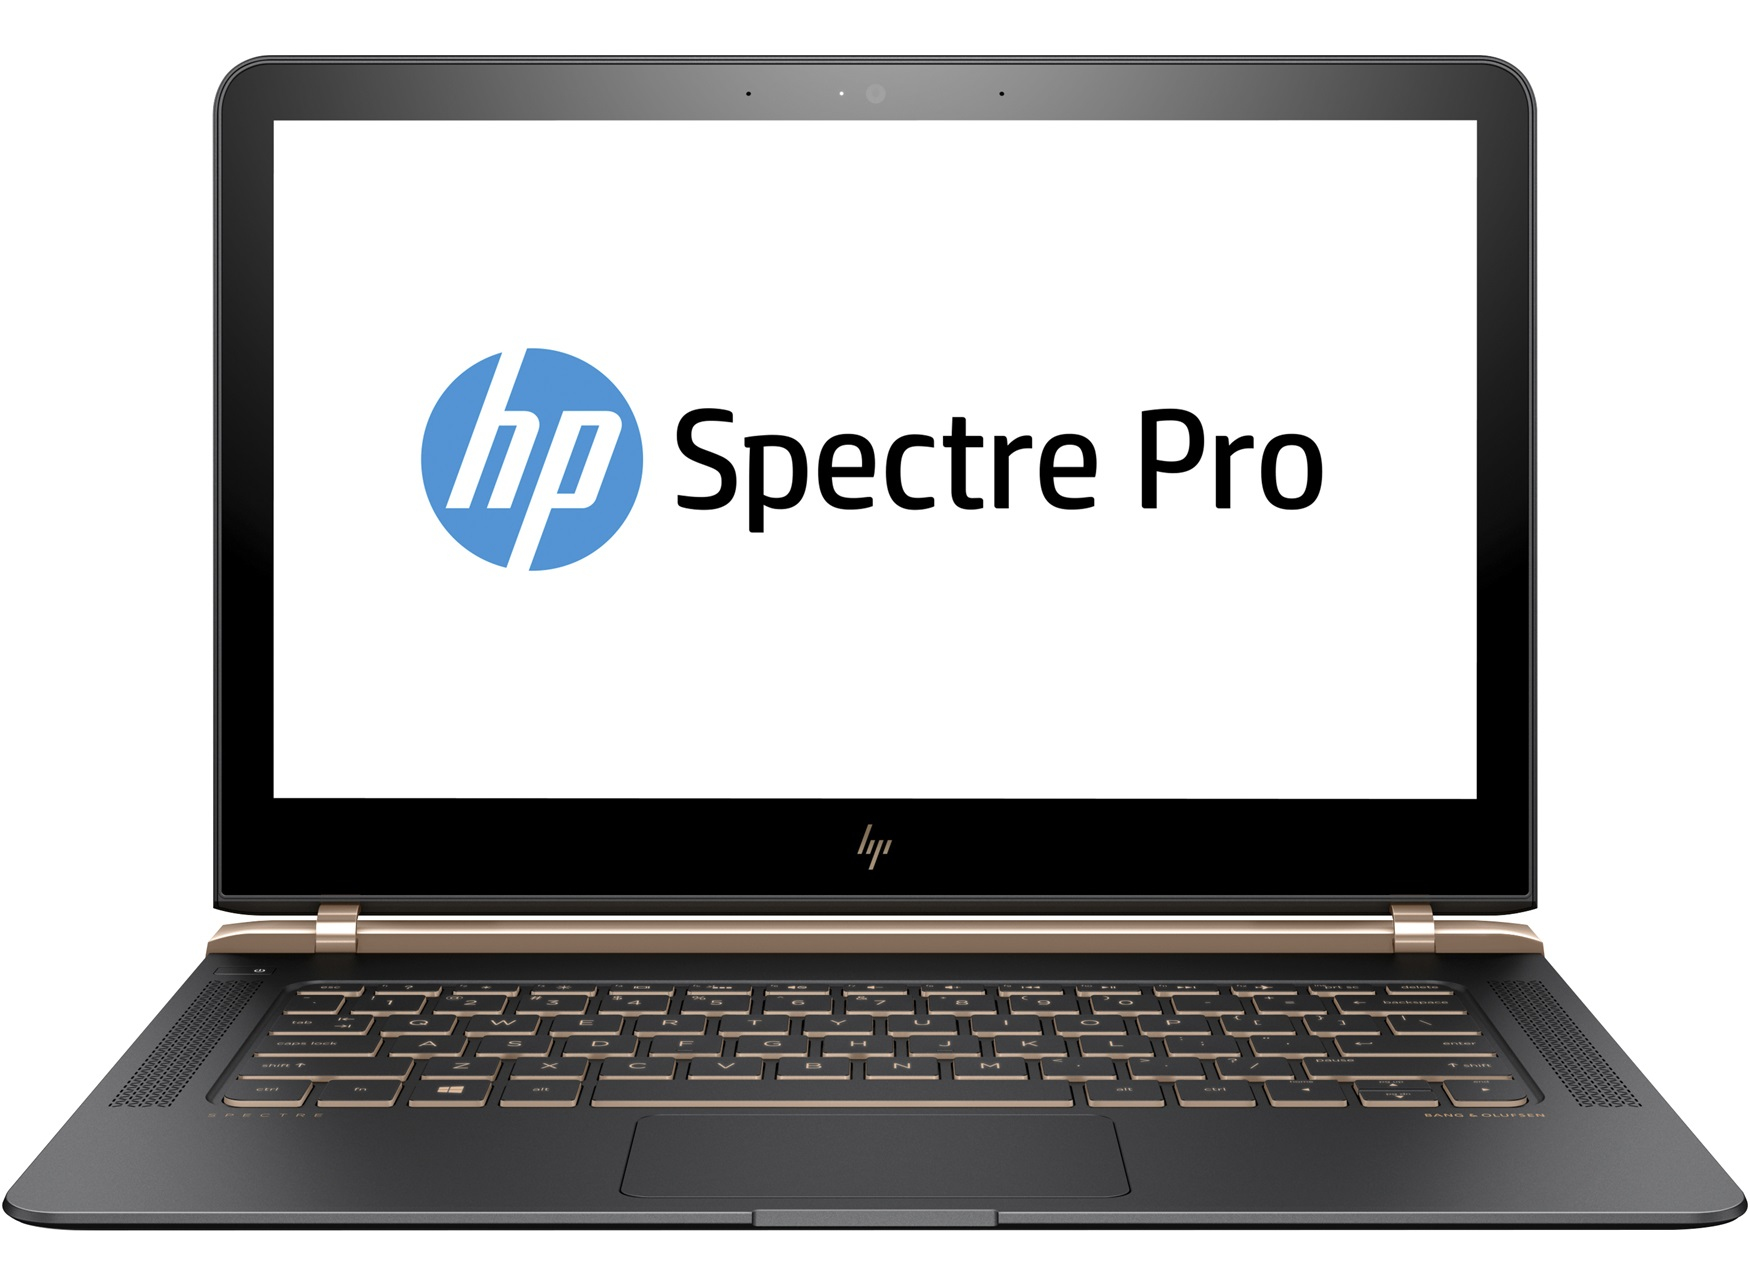 "HP Spectre Pro 13 G1 2.3GHz i5-6200U 13.3"" 1920 x 1080pixels Silver Notebook"